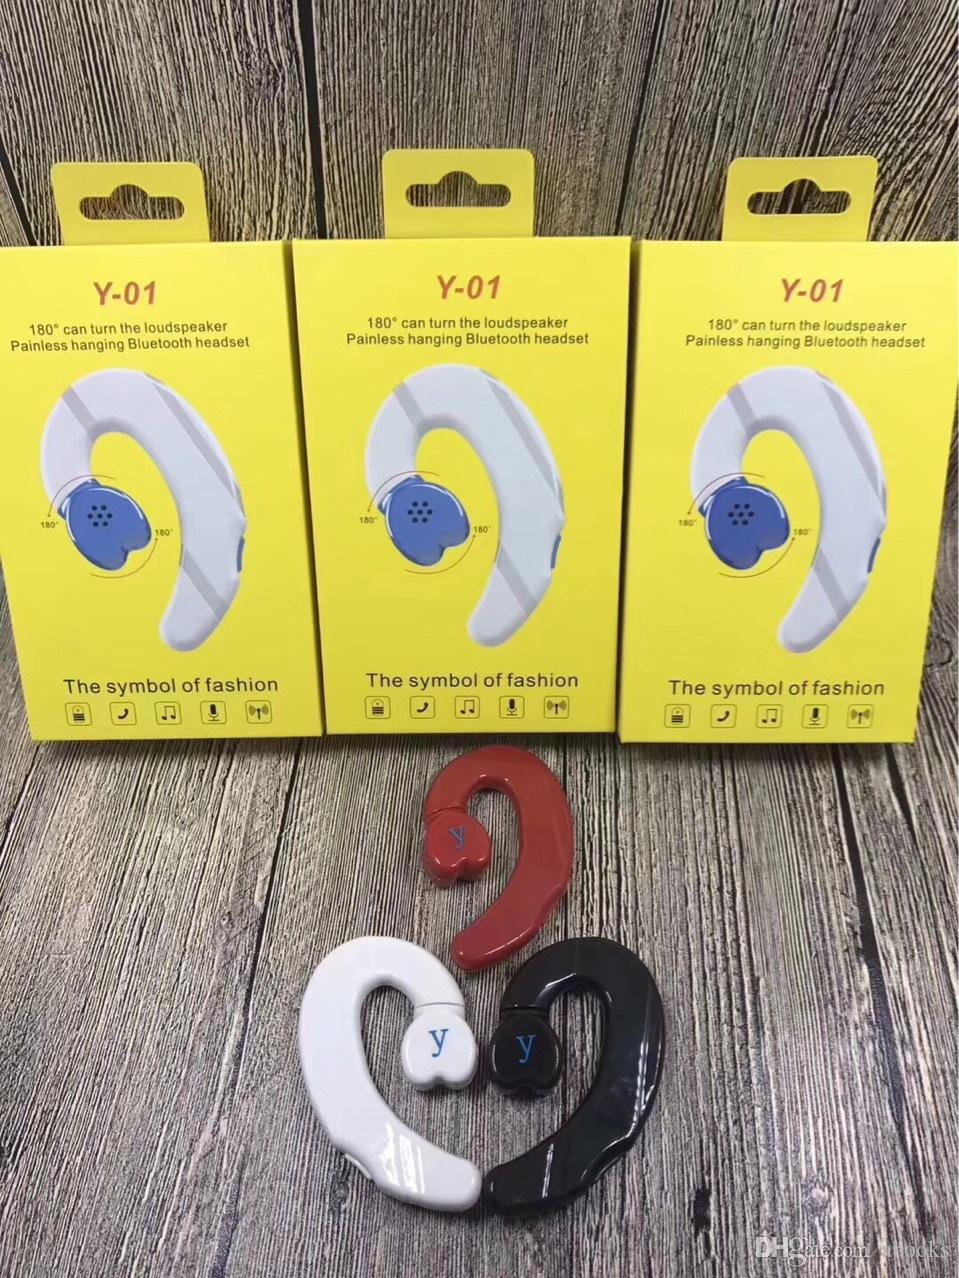 Explosion Models Y 01 Single Ear Bluetooth Headset Long Standby Over Ear Earphones Bluetooth Earphones Long Term For Iphone2019 2018 Explosion Models Y 01 Single Ear Headset Single Ear Bluetooth Headset Bluetooth Earphones Long Term For Iphone